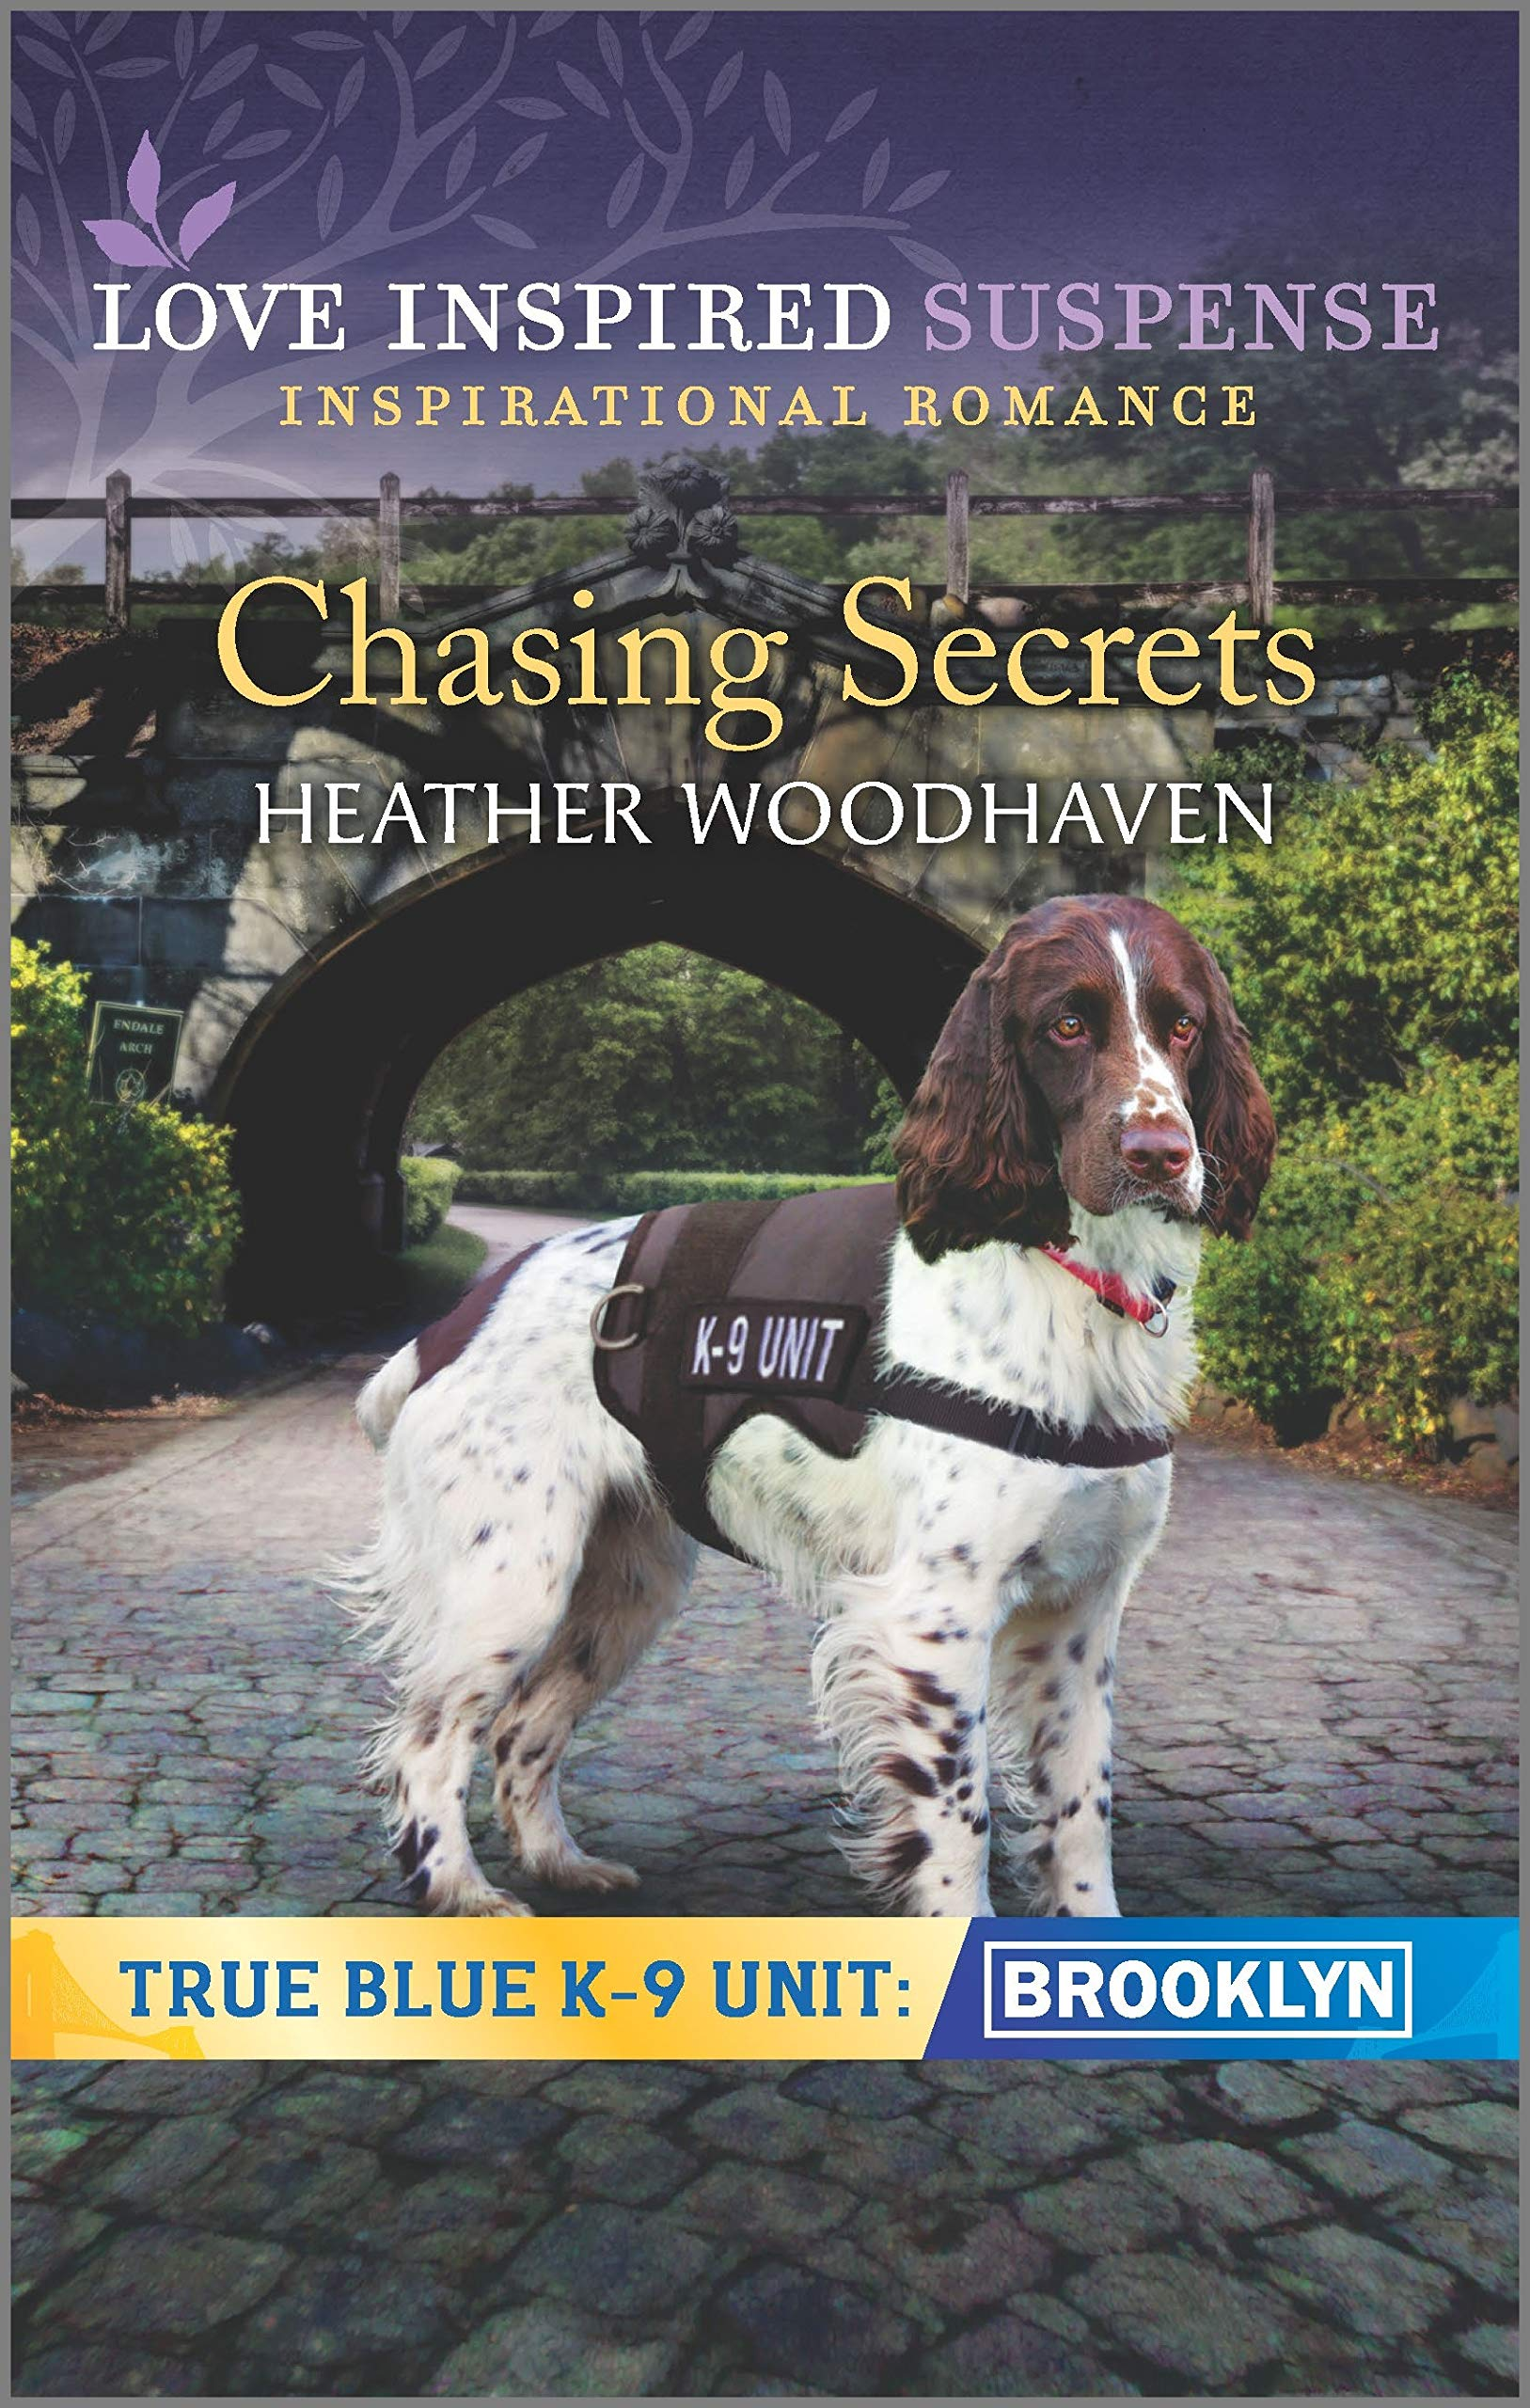 Chasing Secrets (True Blue K-9 Unit: Brooklyn #2)